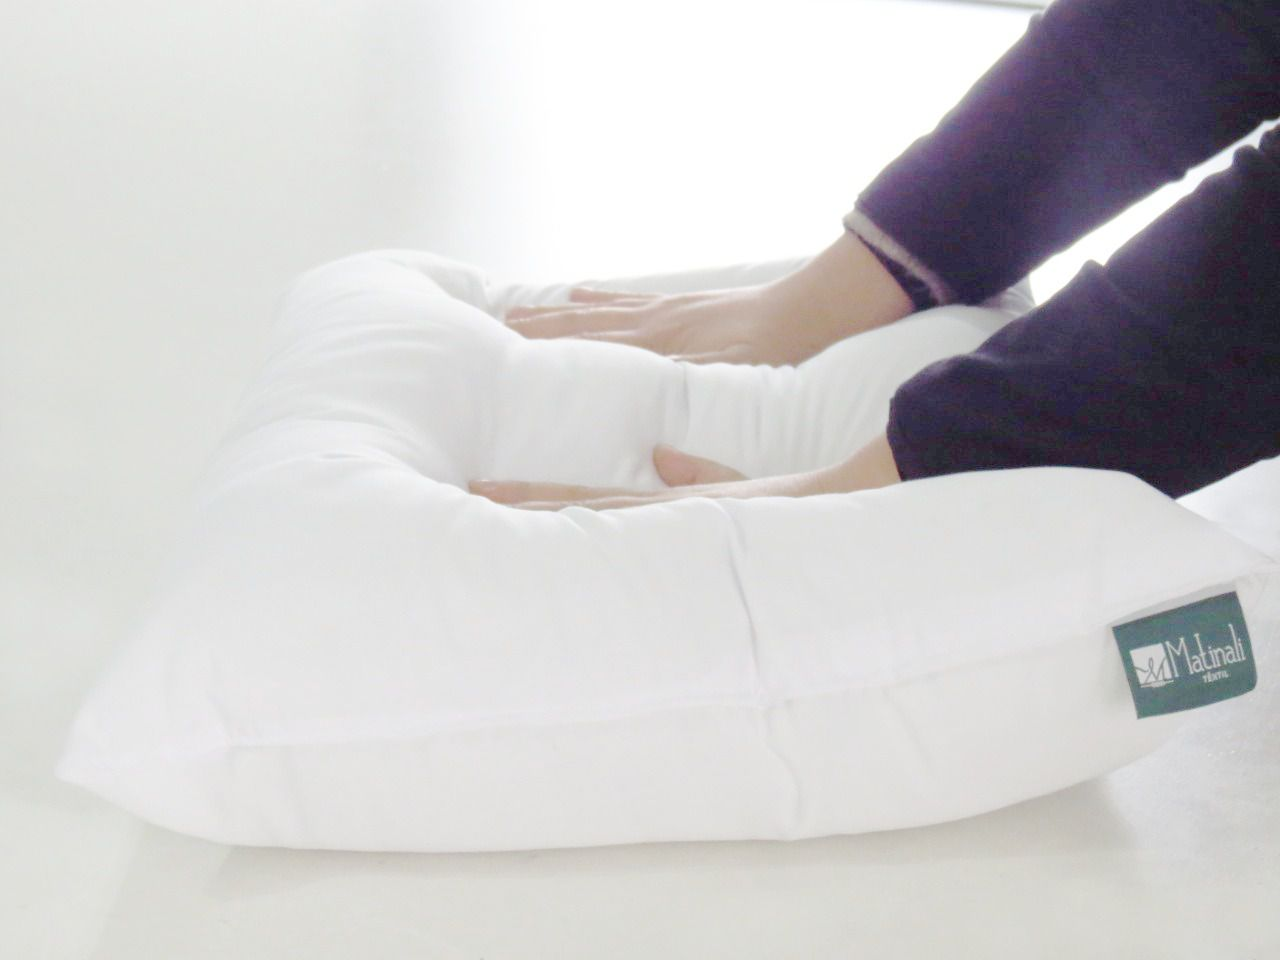 Travesseiro 600g - Suporte firme - Matinali Têxtil